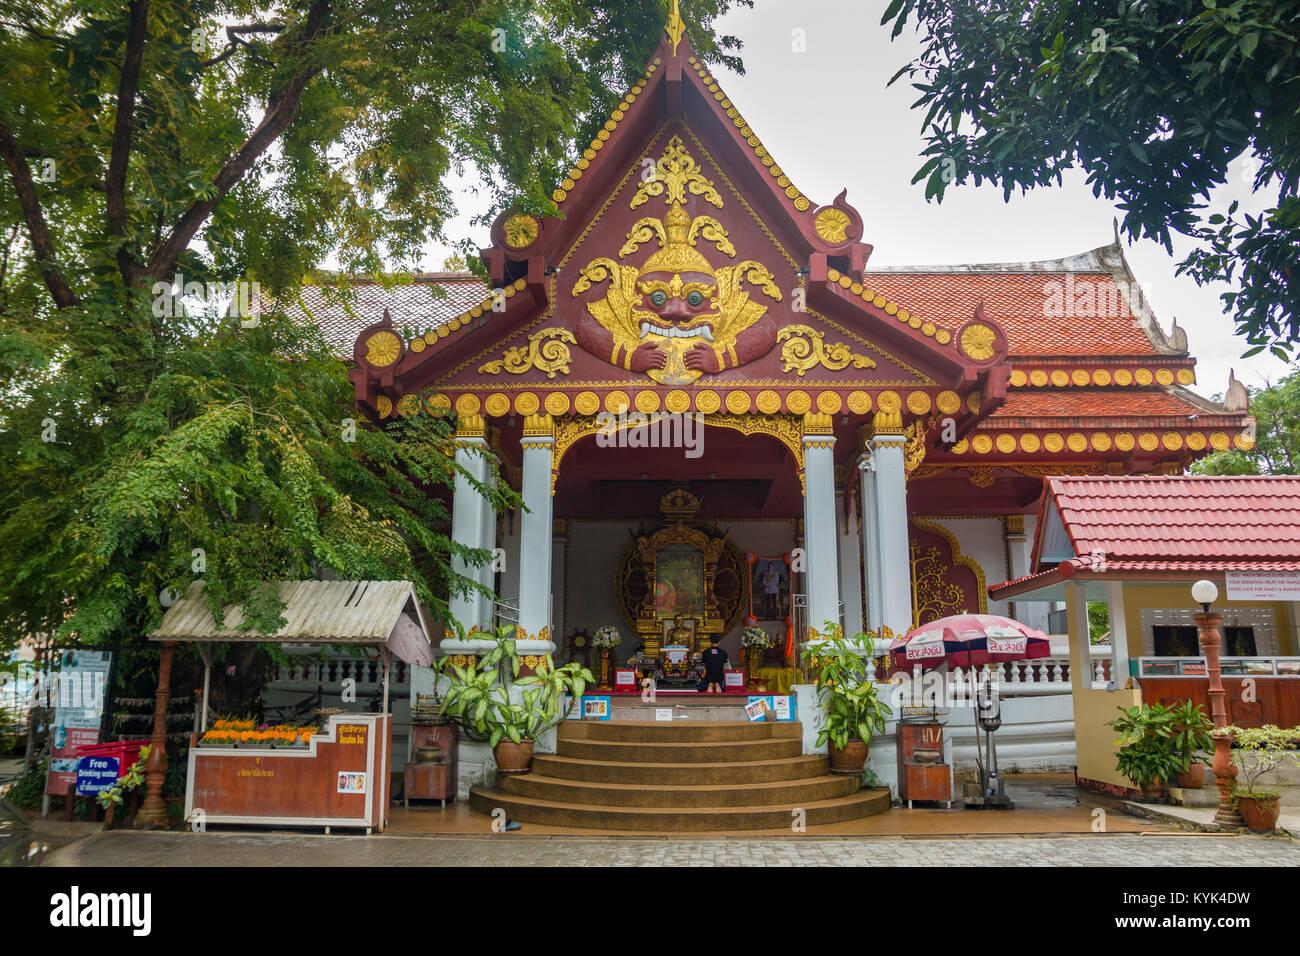 SAMUI, THAILAND - 06.11.2017: Mummified monk Loung Pordaeng in Wat Khunaram temple in Koh Samui in Thailand Stock Photo